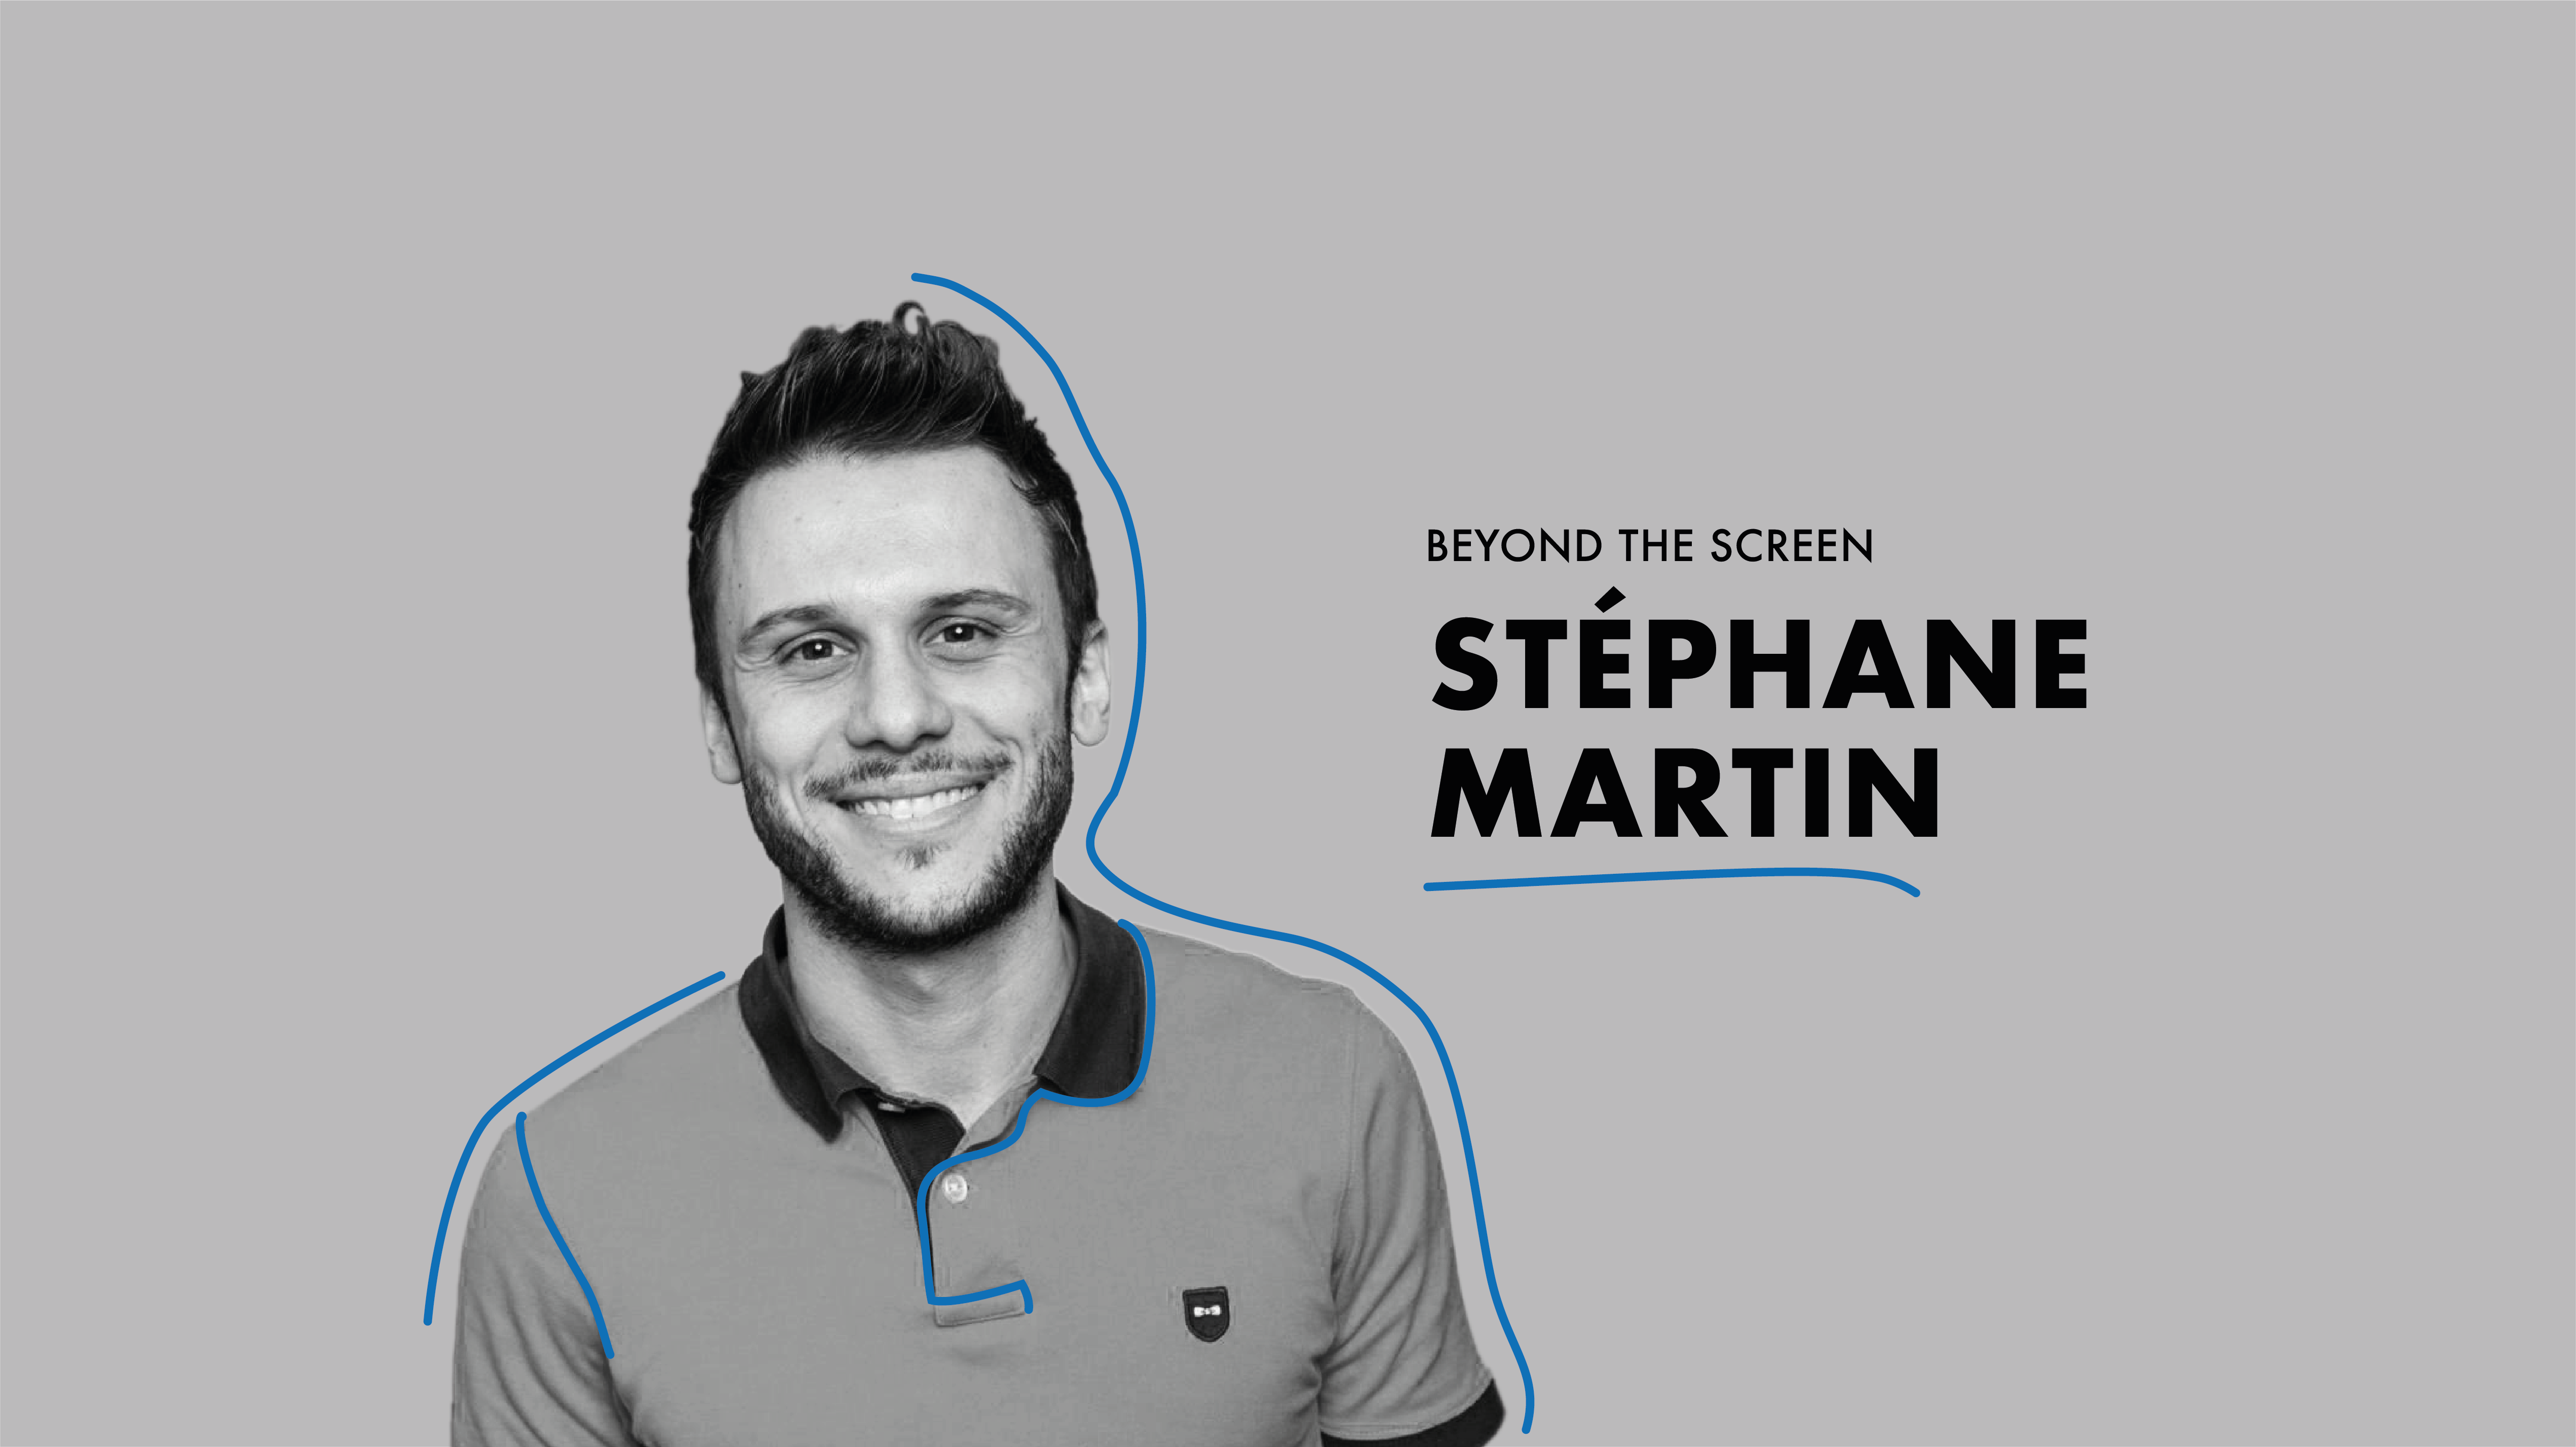 Good patch interview, beyond the screen: Stéphane Martin